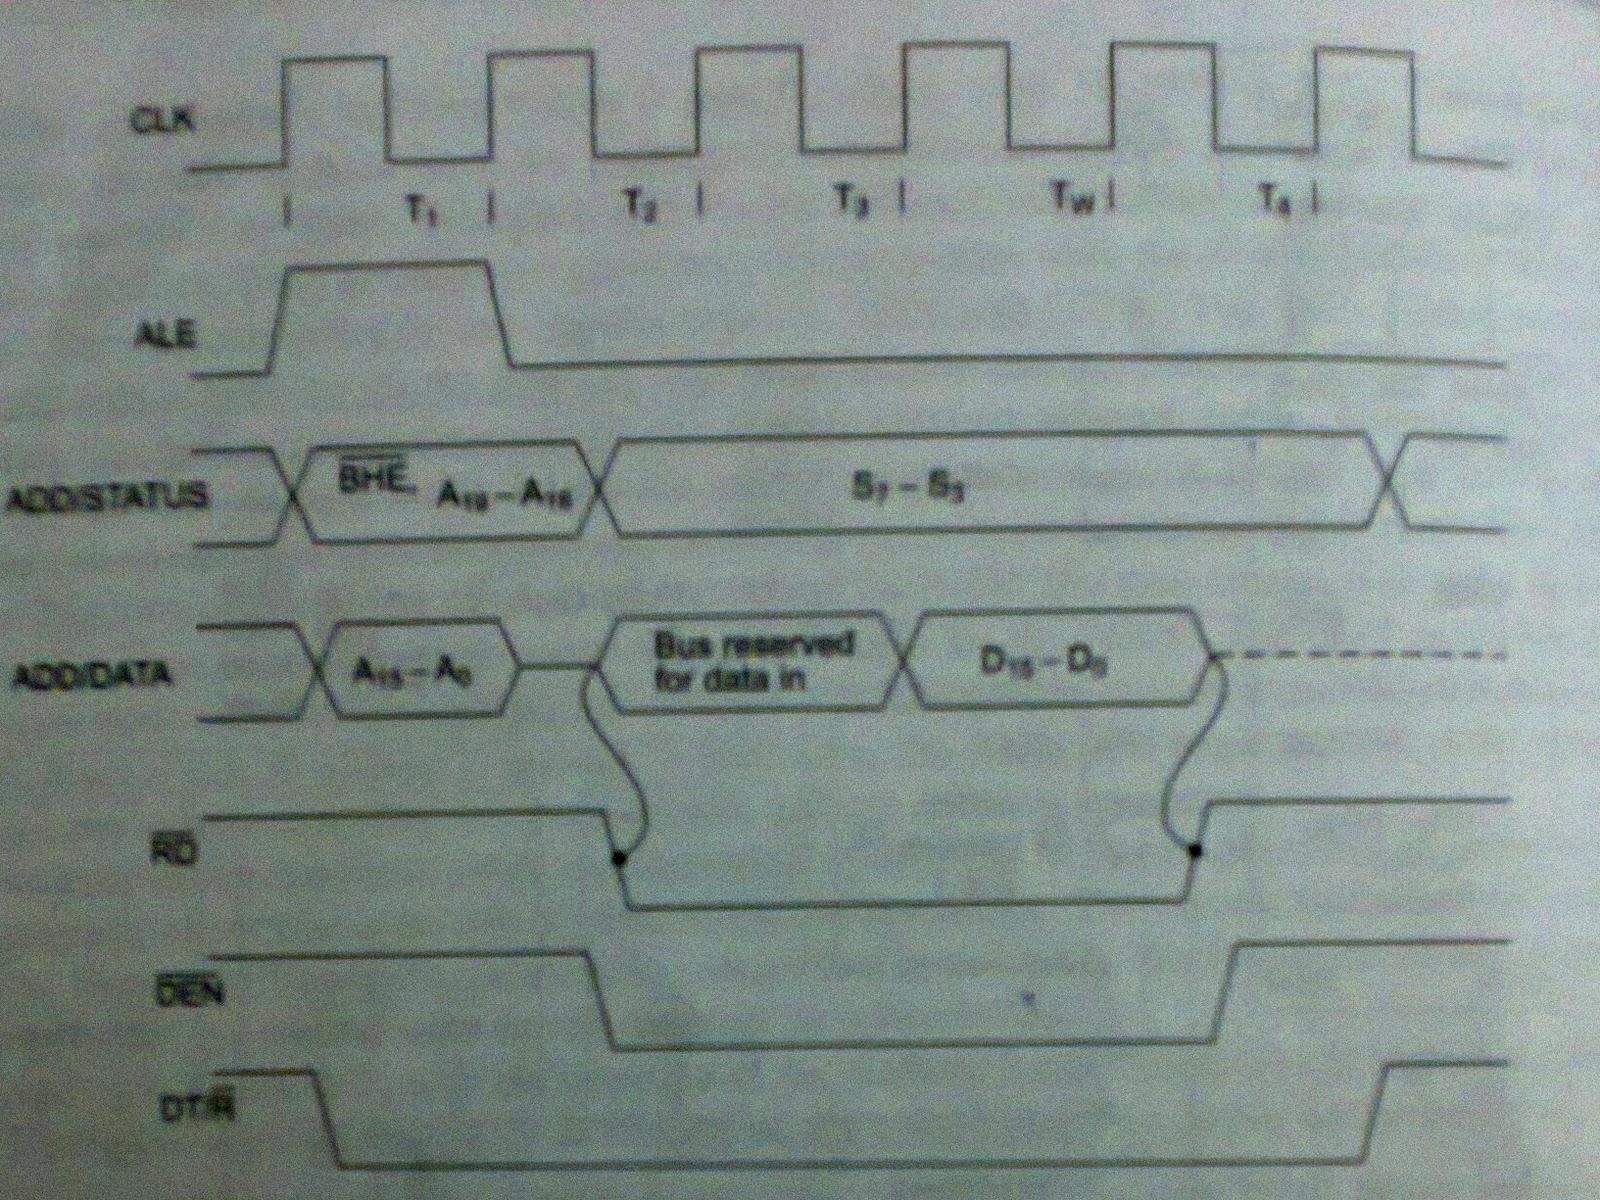 Timing diagram of 8086 microprocessor in minimum mode